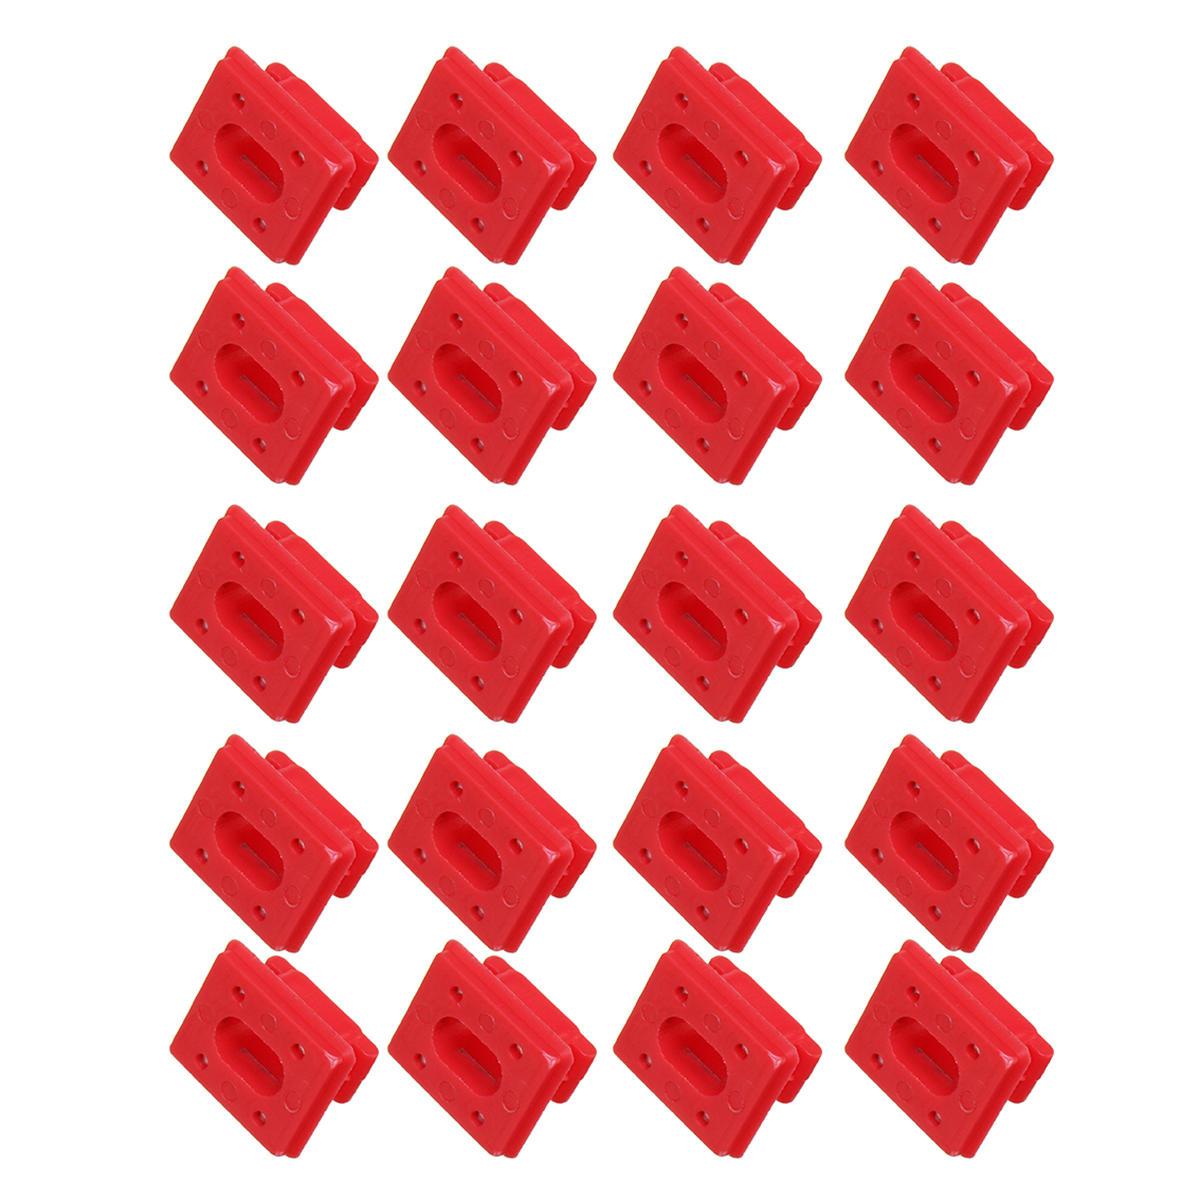 20pcs / set Dashboard Dash Trim Strip Clips Red Insert Grommets Keeper Clip Fit para BMW E46 E65 / E66 E83N Hebillas de